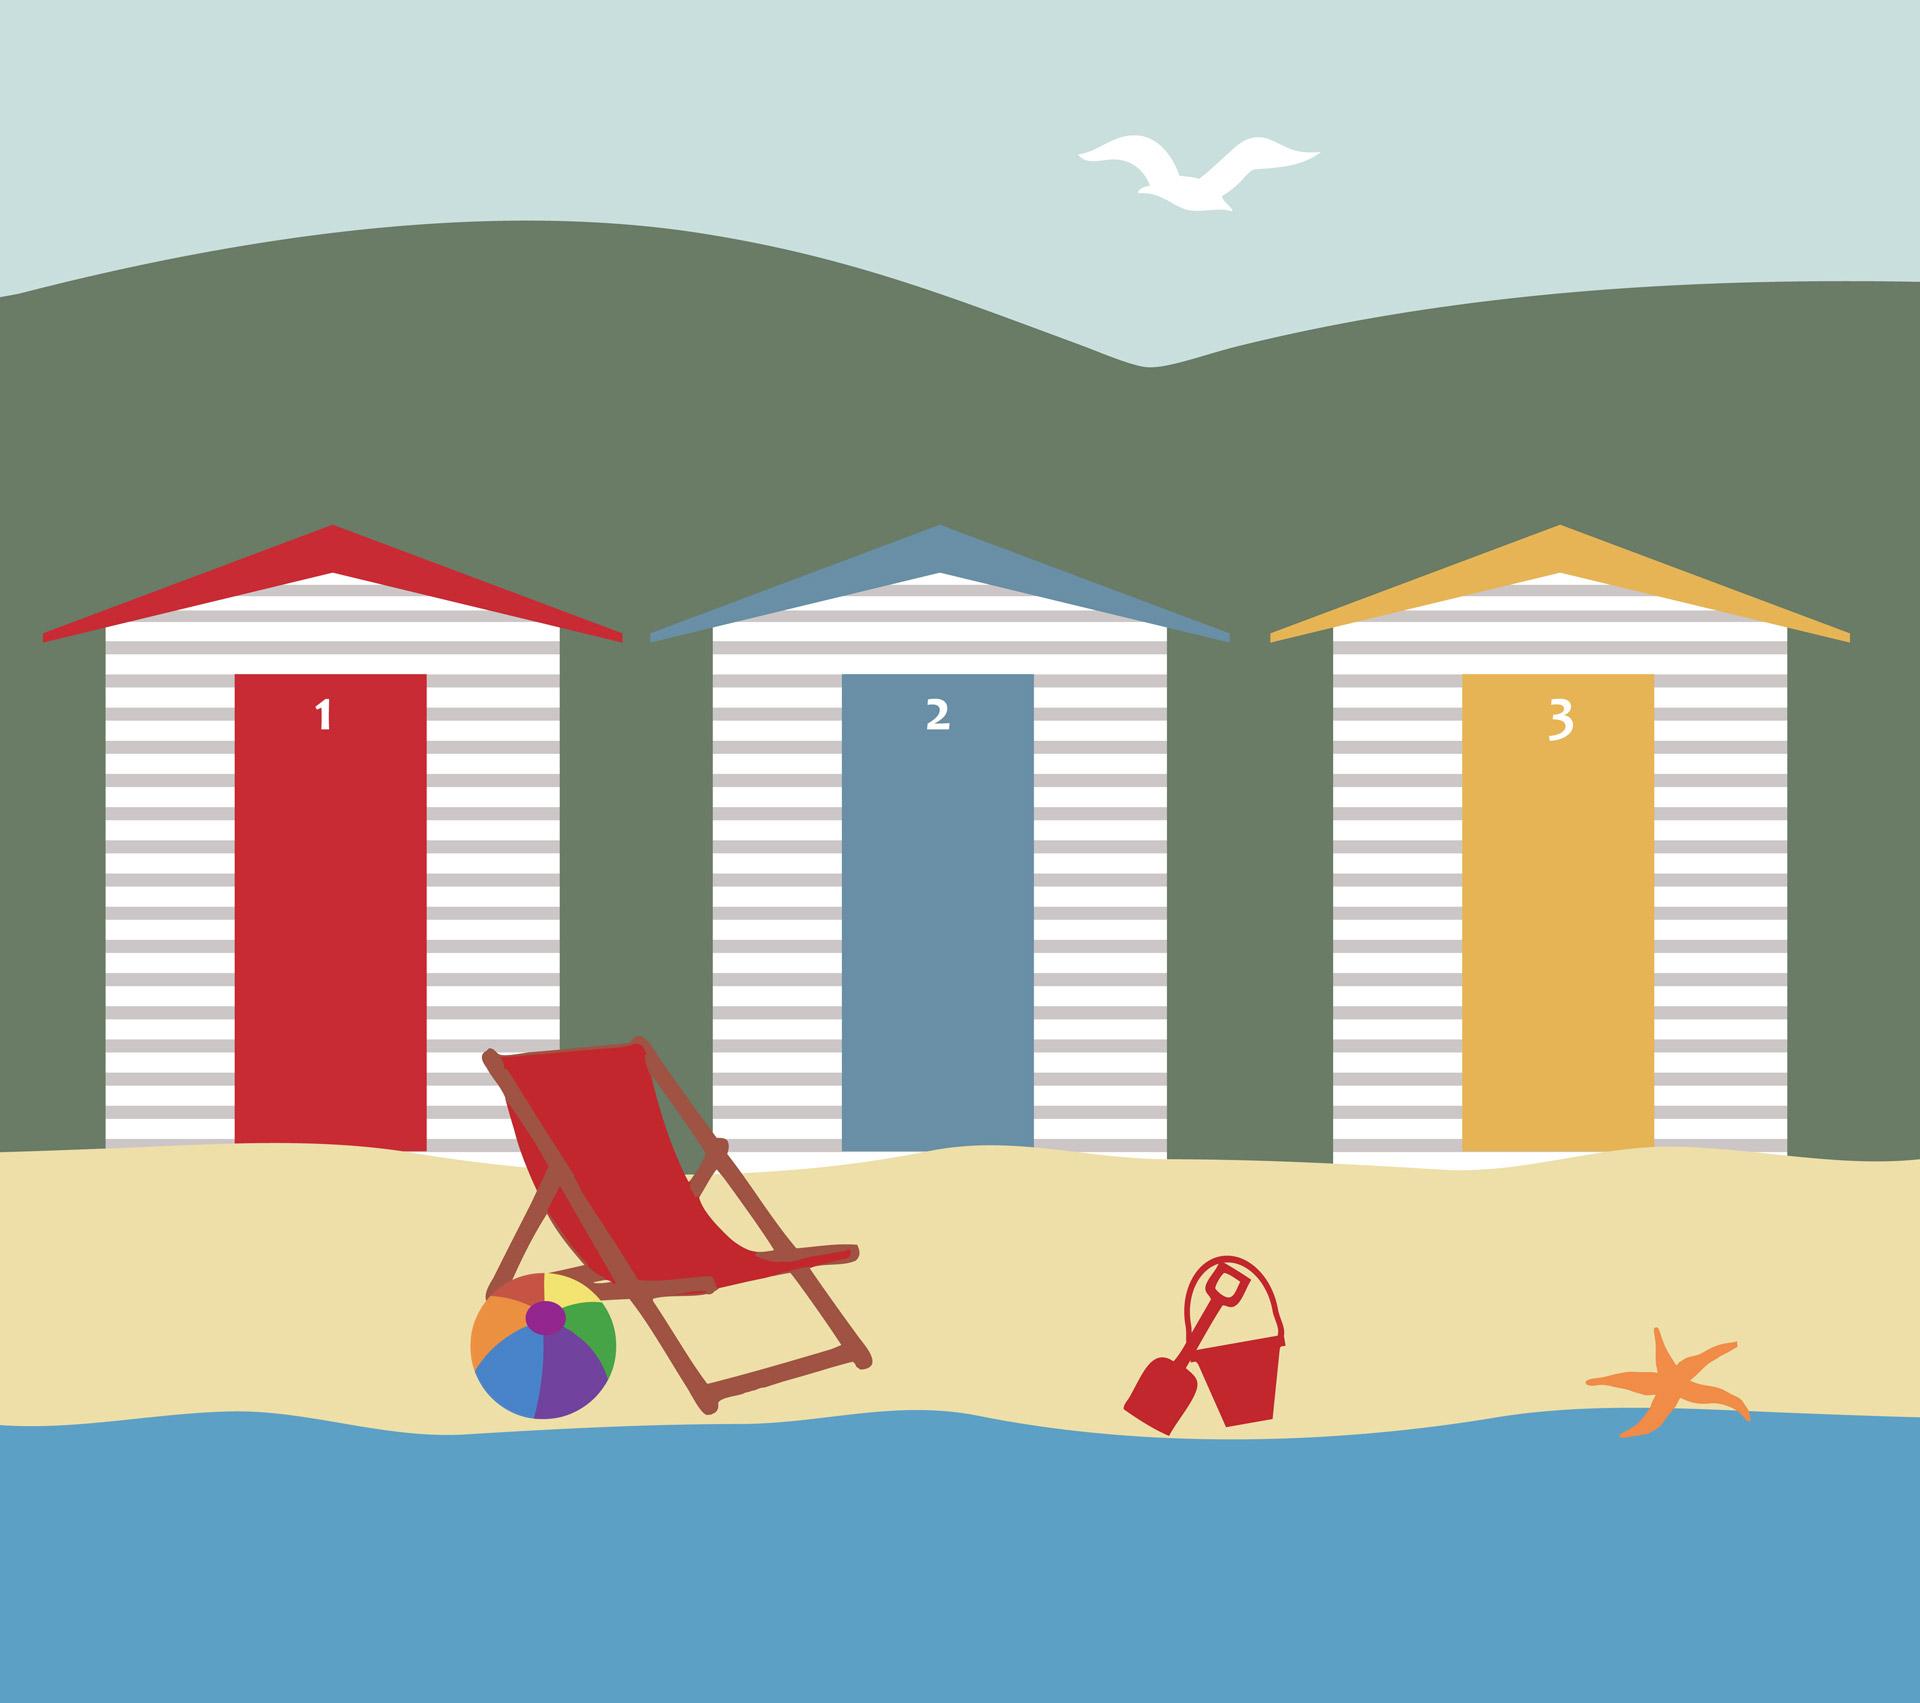 Seaside clipart #12, Download drawings